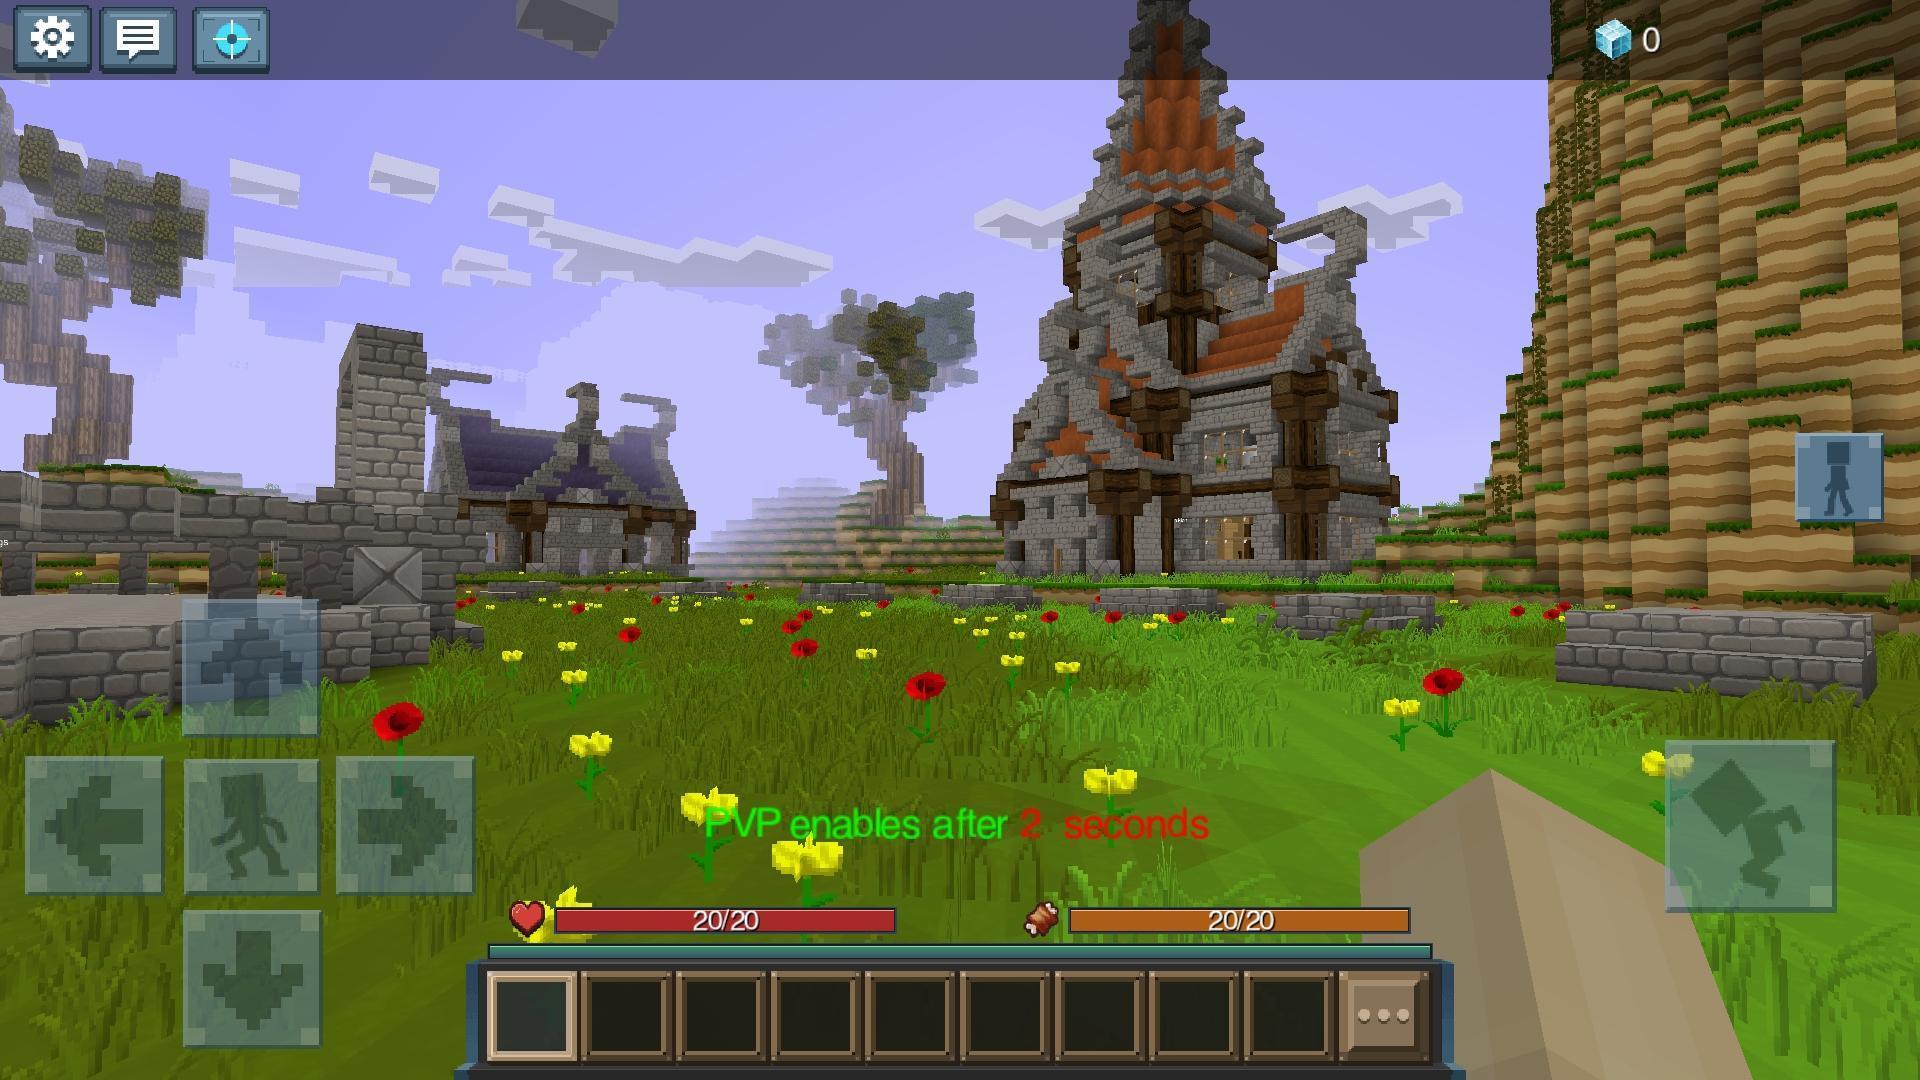 download the survival hunger games 2 mod apk